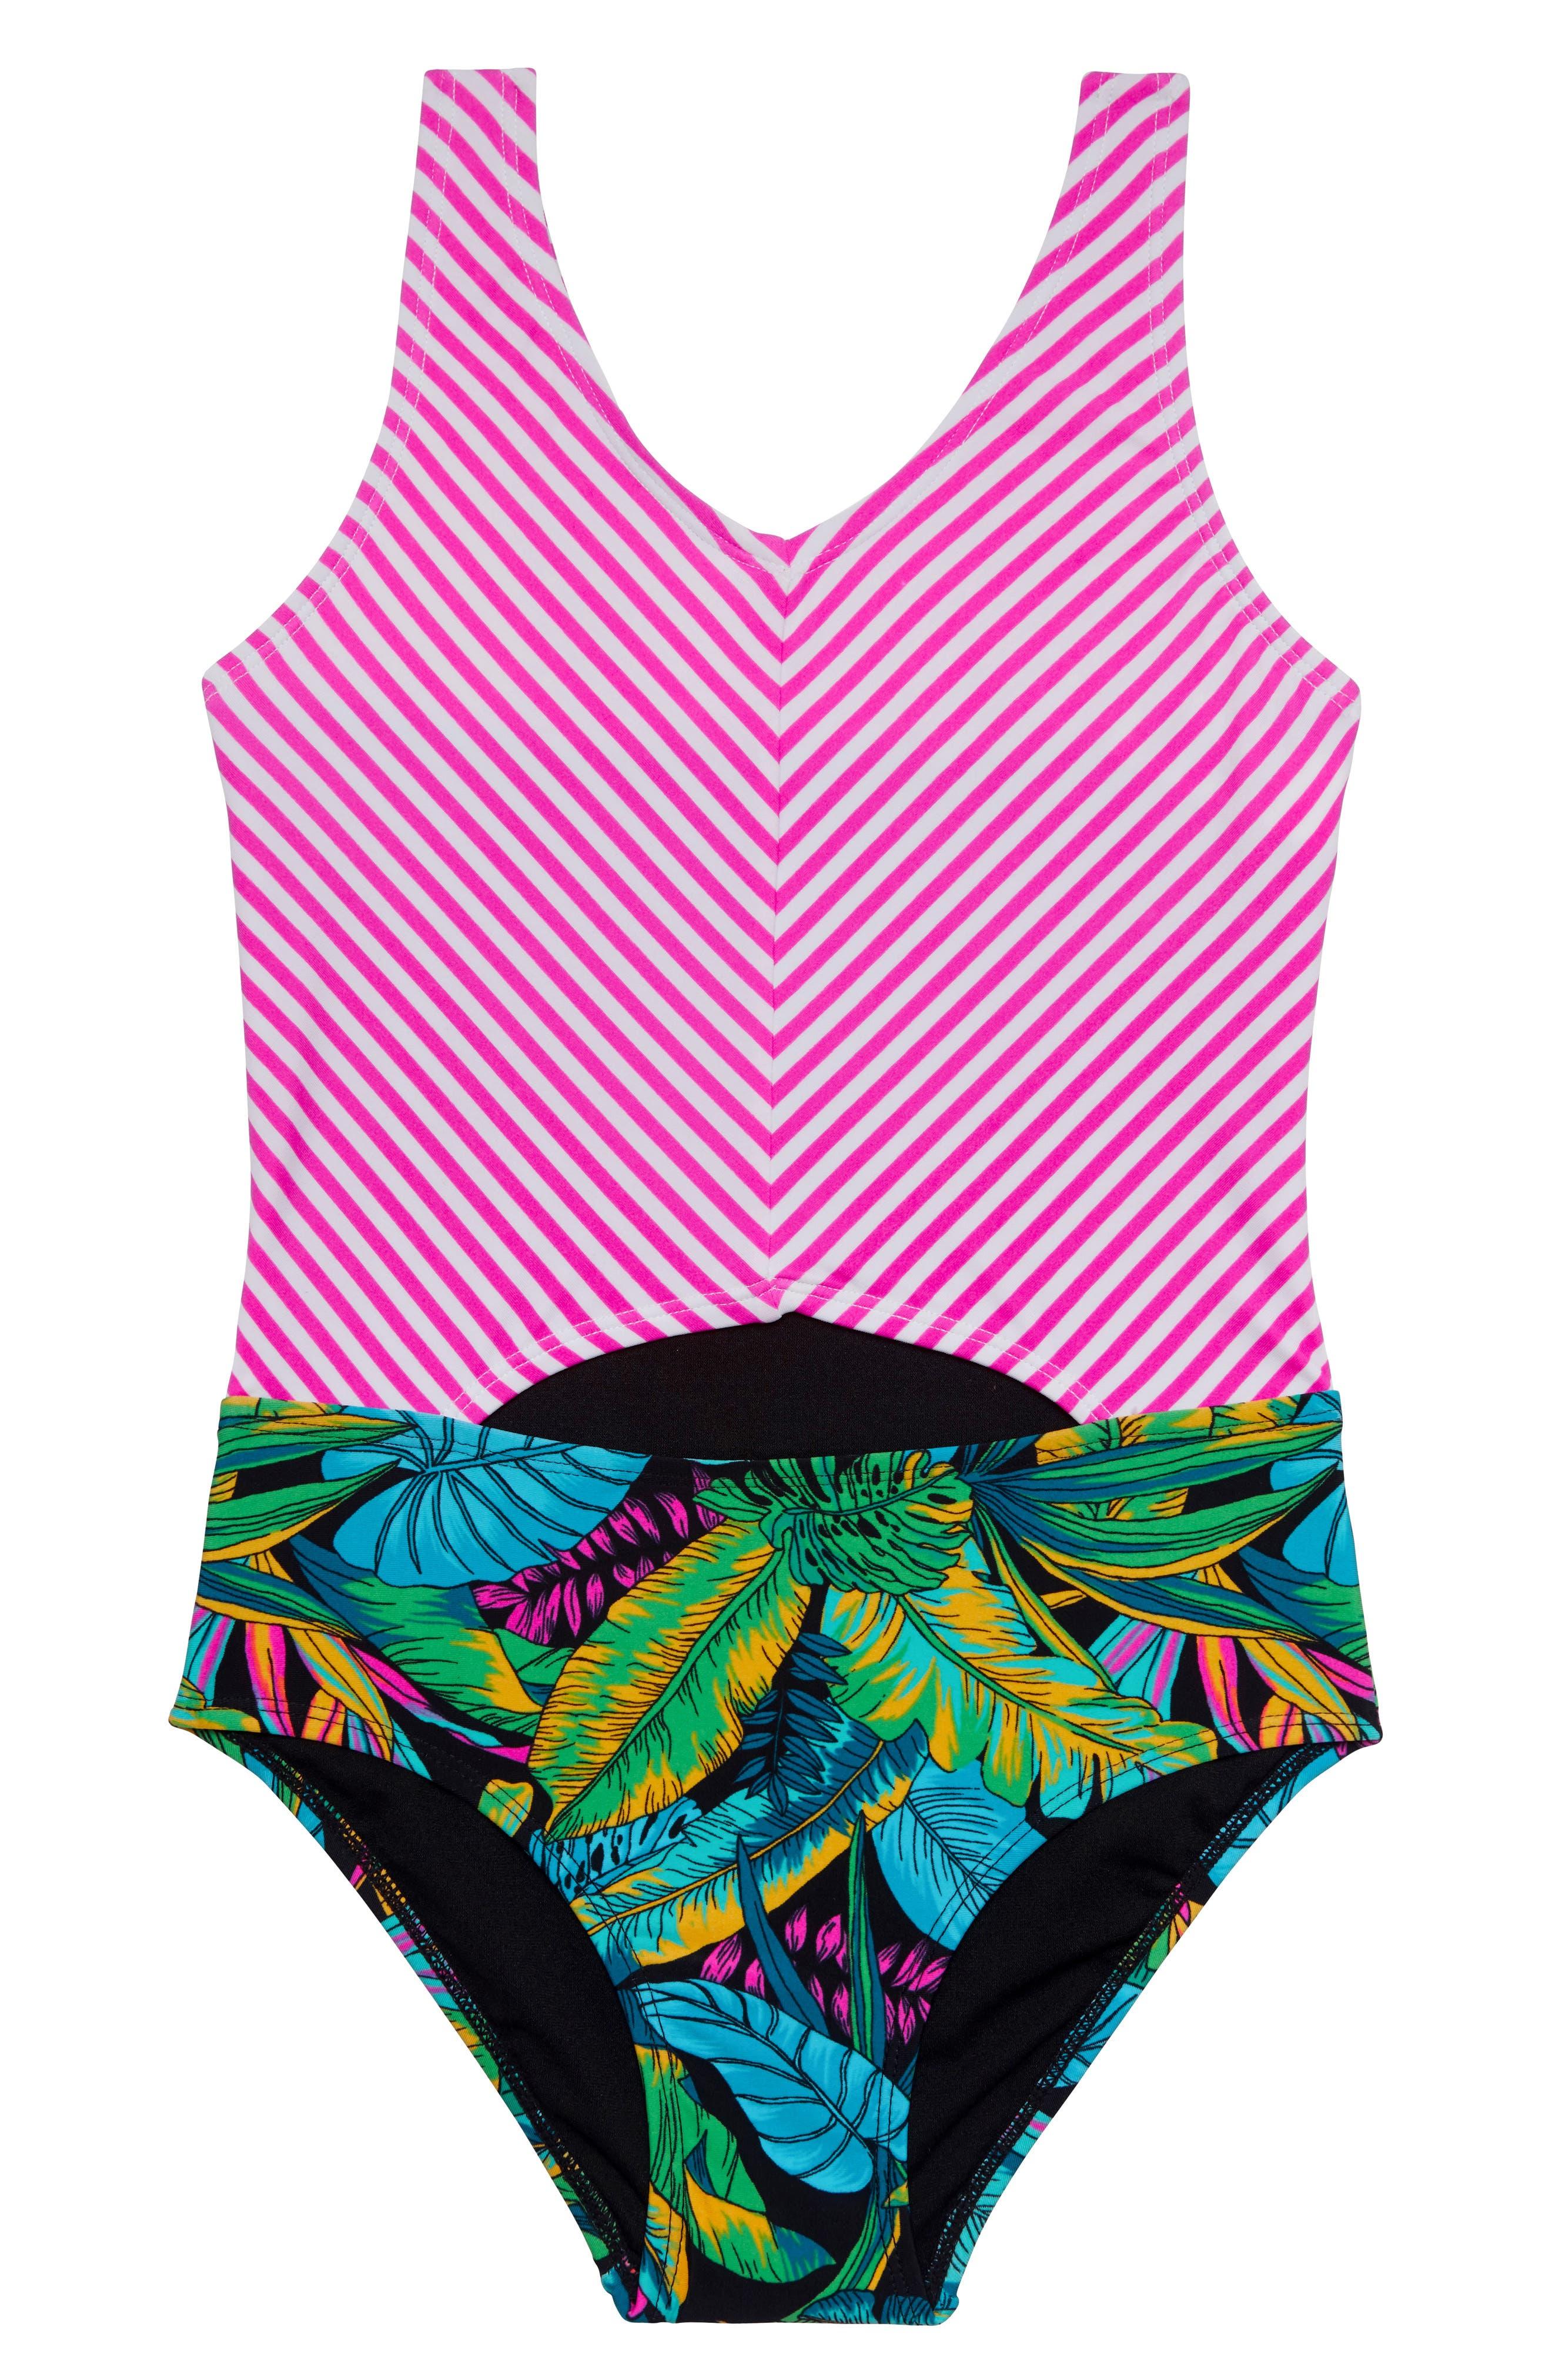 Girls Gossip Girl Electric Jungle OnePiece Swimsuit Size 14  Black